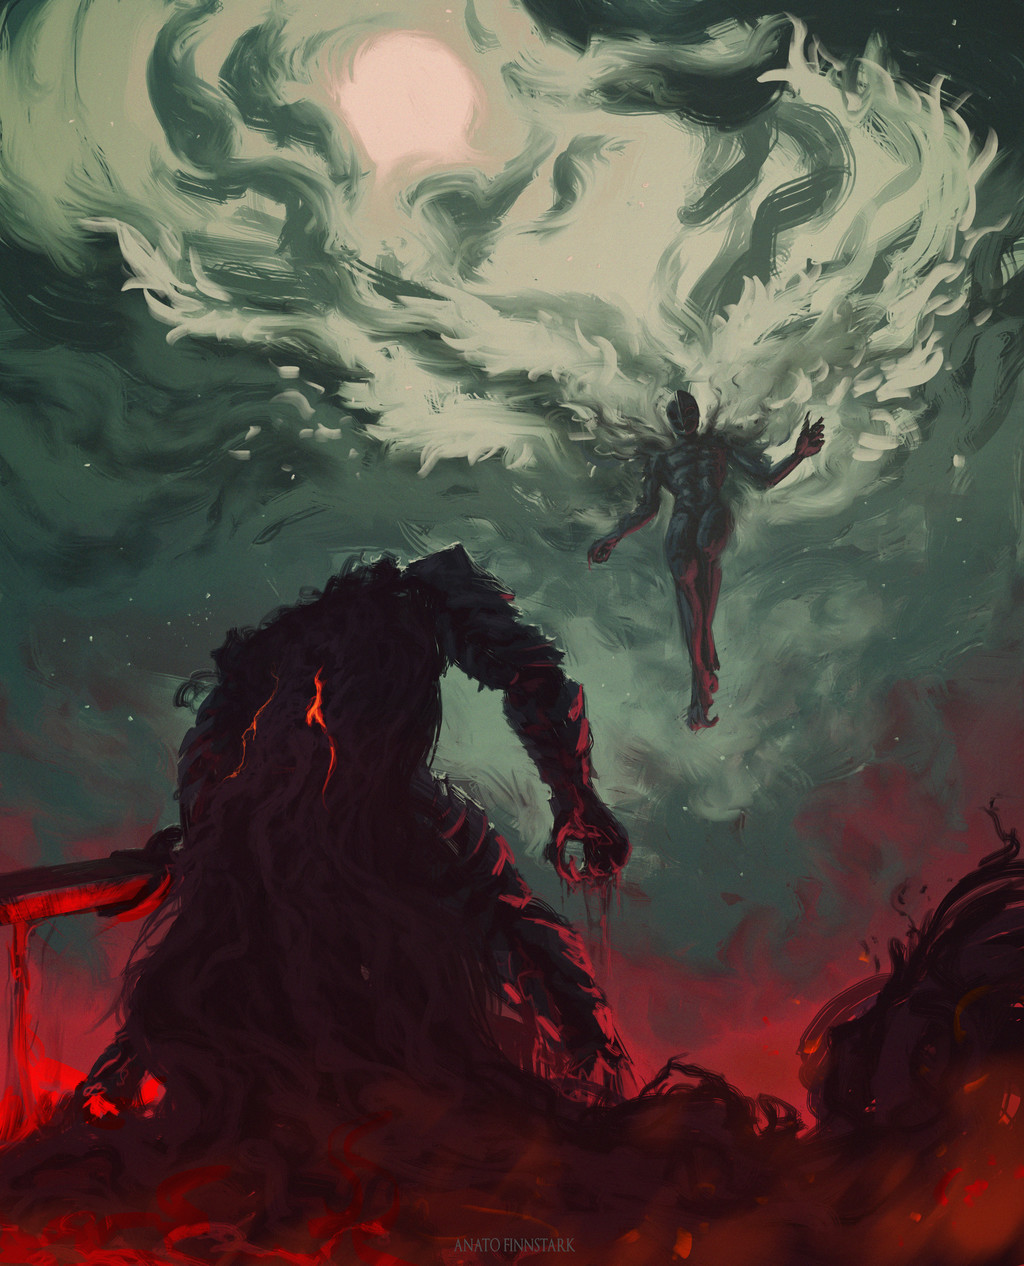 Anato finnstark time to release the beast berserk by anatofinnstark dcsgiyg